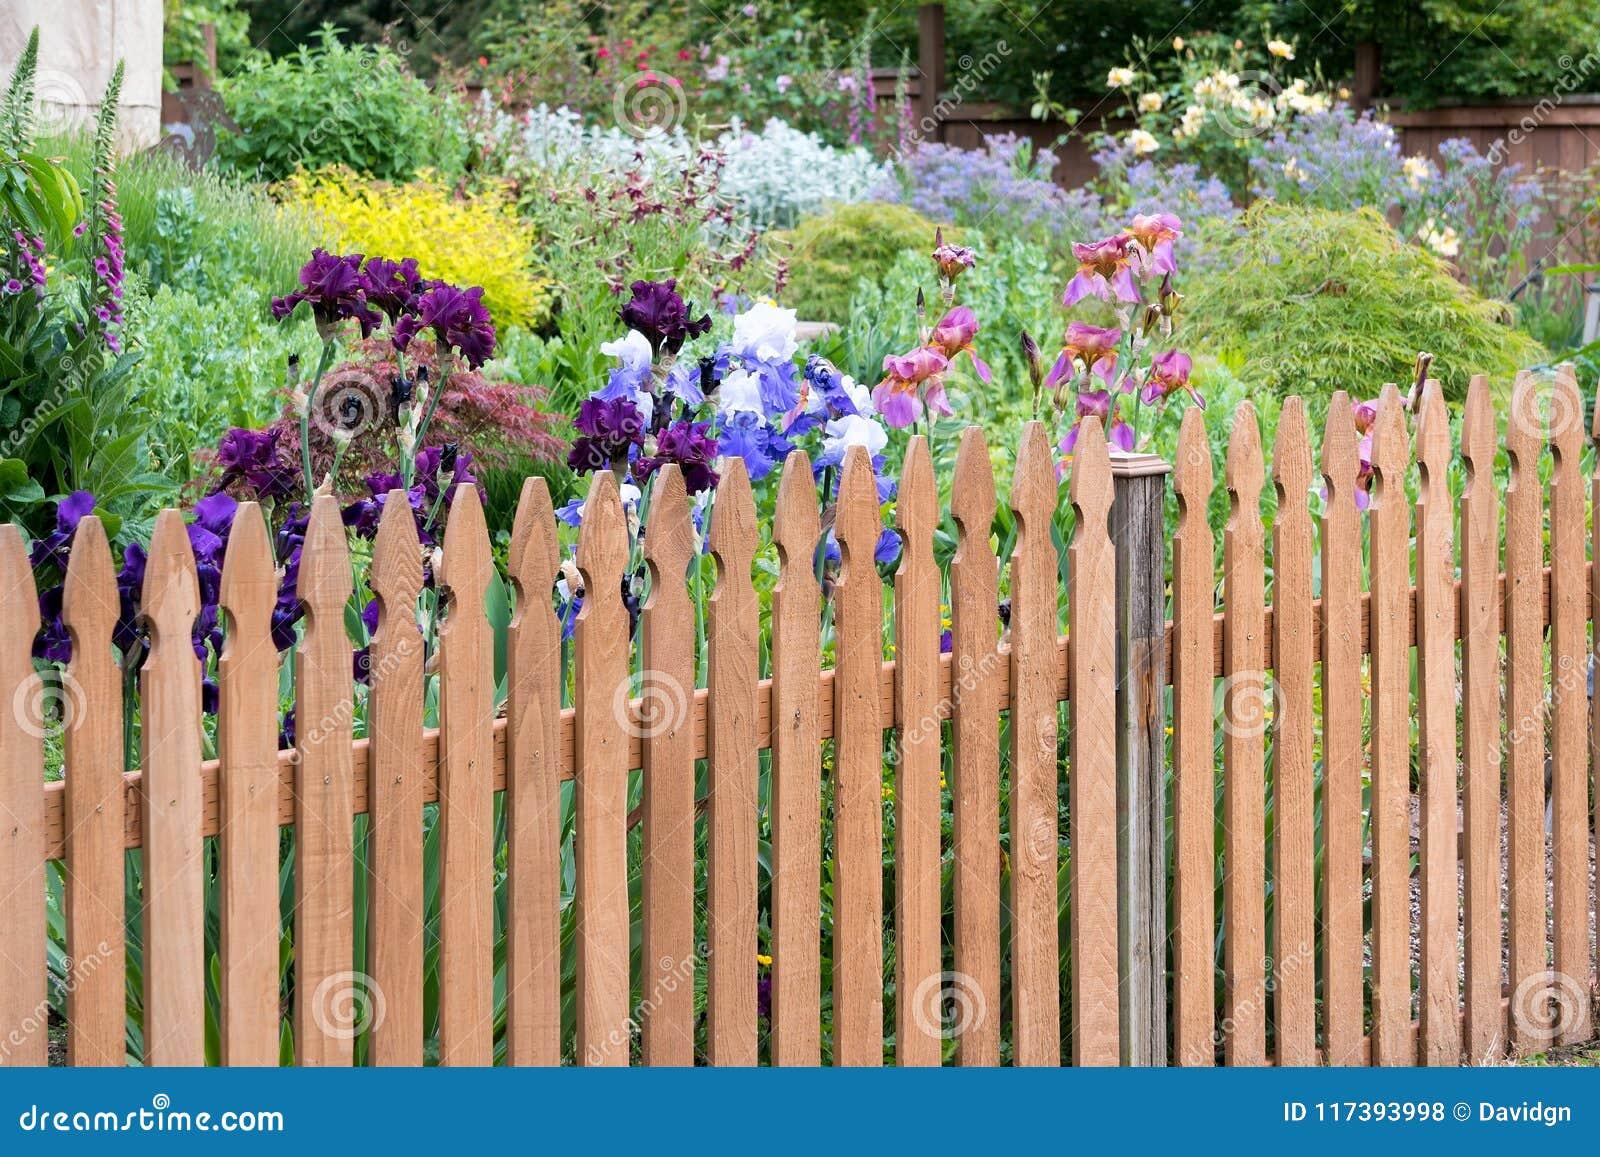 Picket Fence In Backyard Flower Garden Stock Photo Image Of